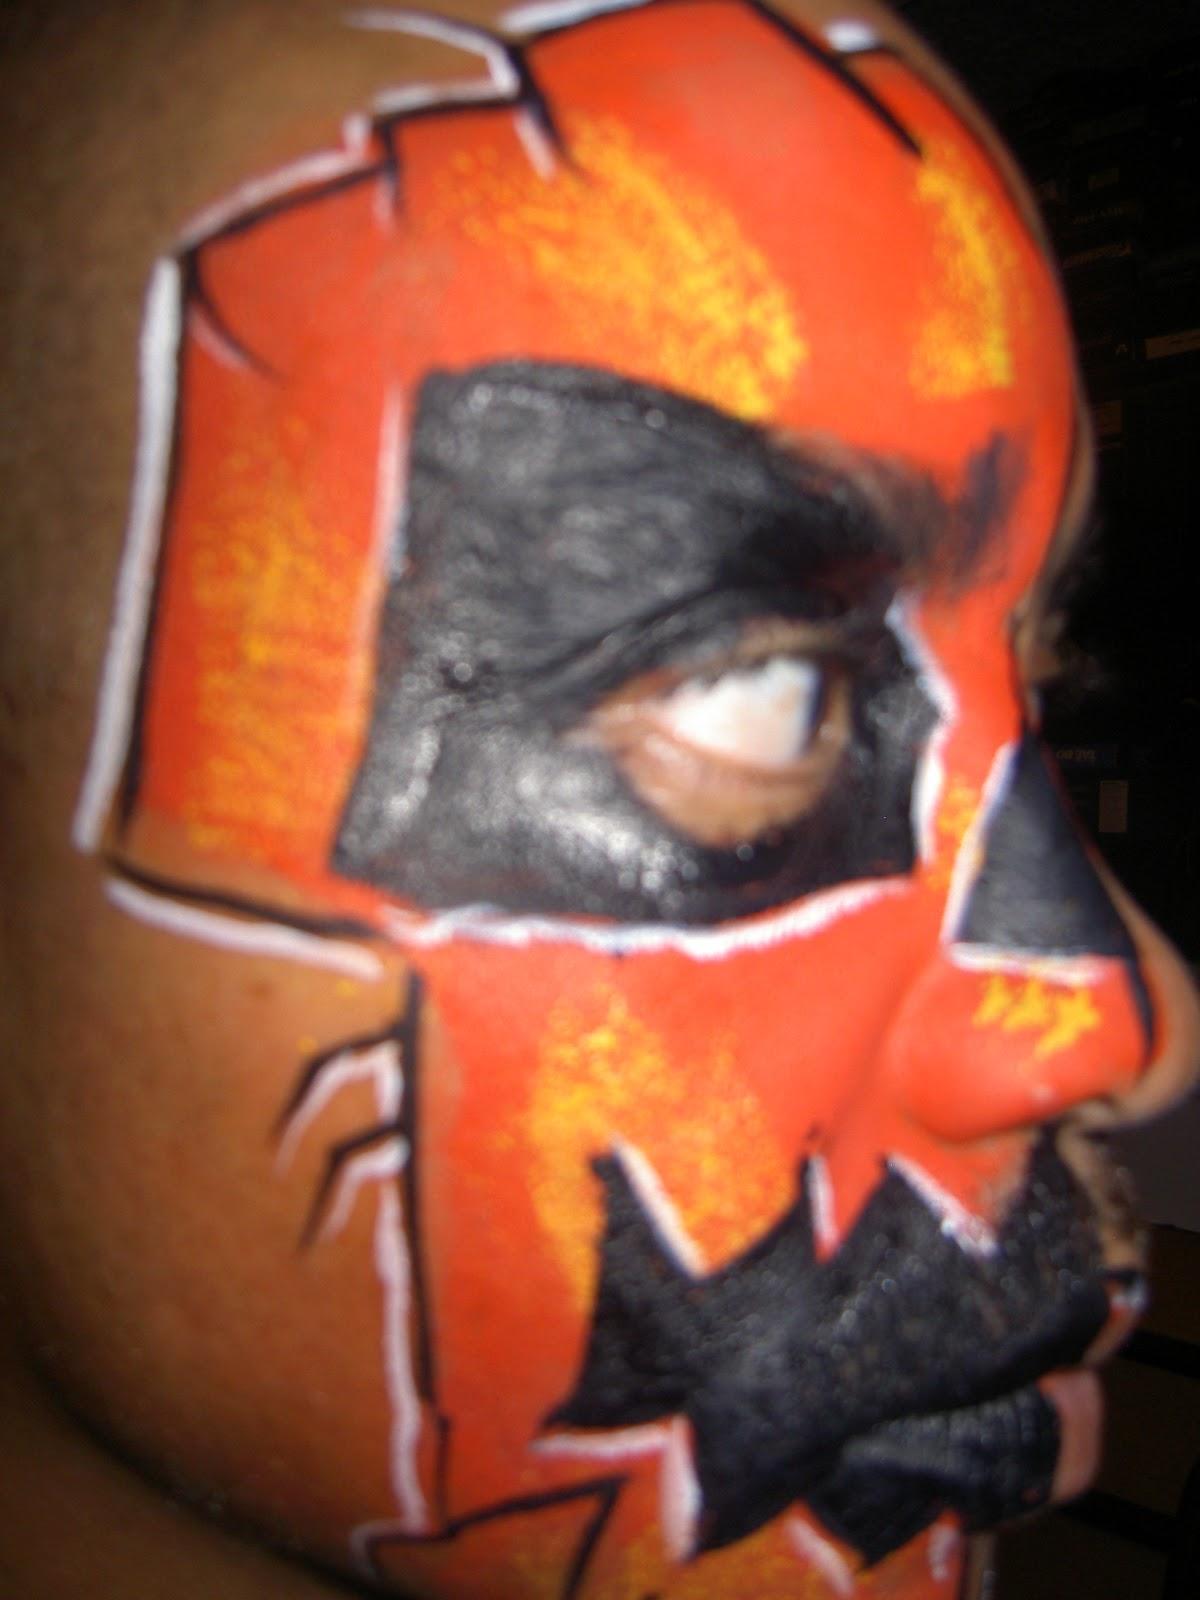 Sandys Land Parties Events Mask Verse Face Painting Jpg 1200x1600 Jack Pumpkin